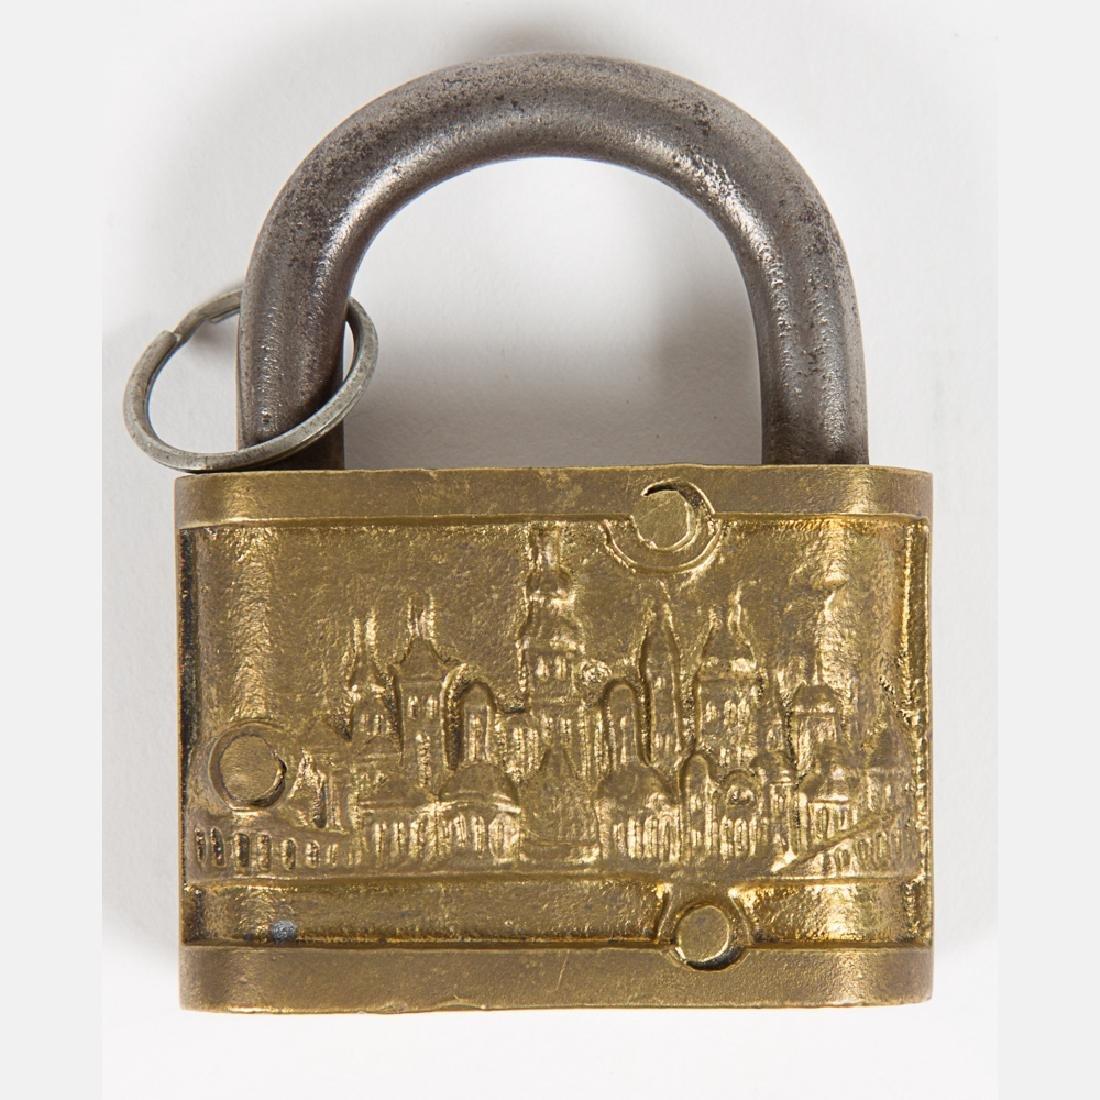 An Iron and Brass Eagle Lock & Co. World's Fair 1904 - 5